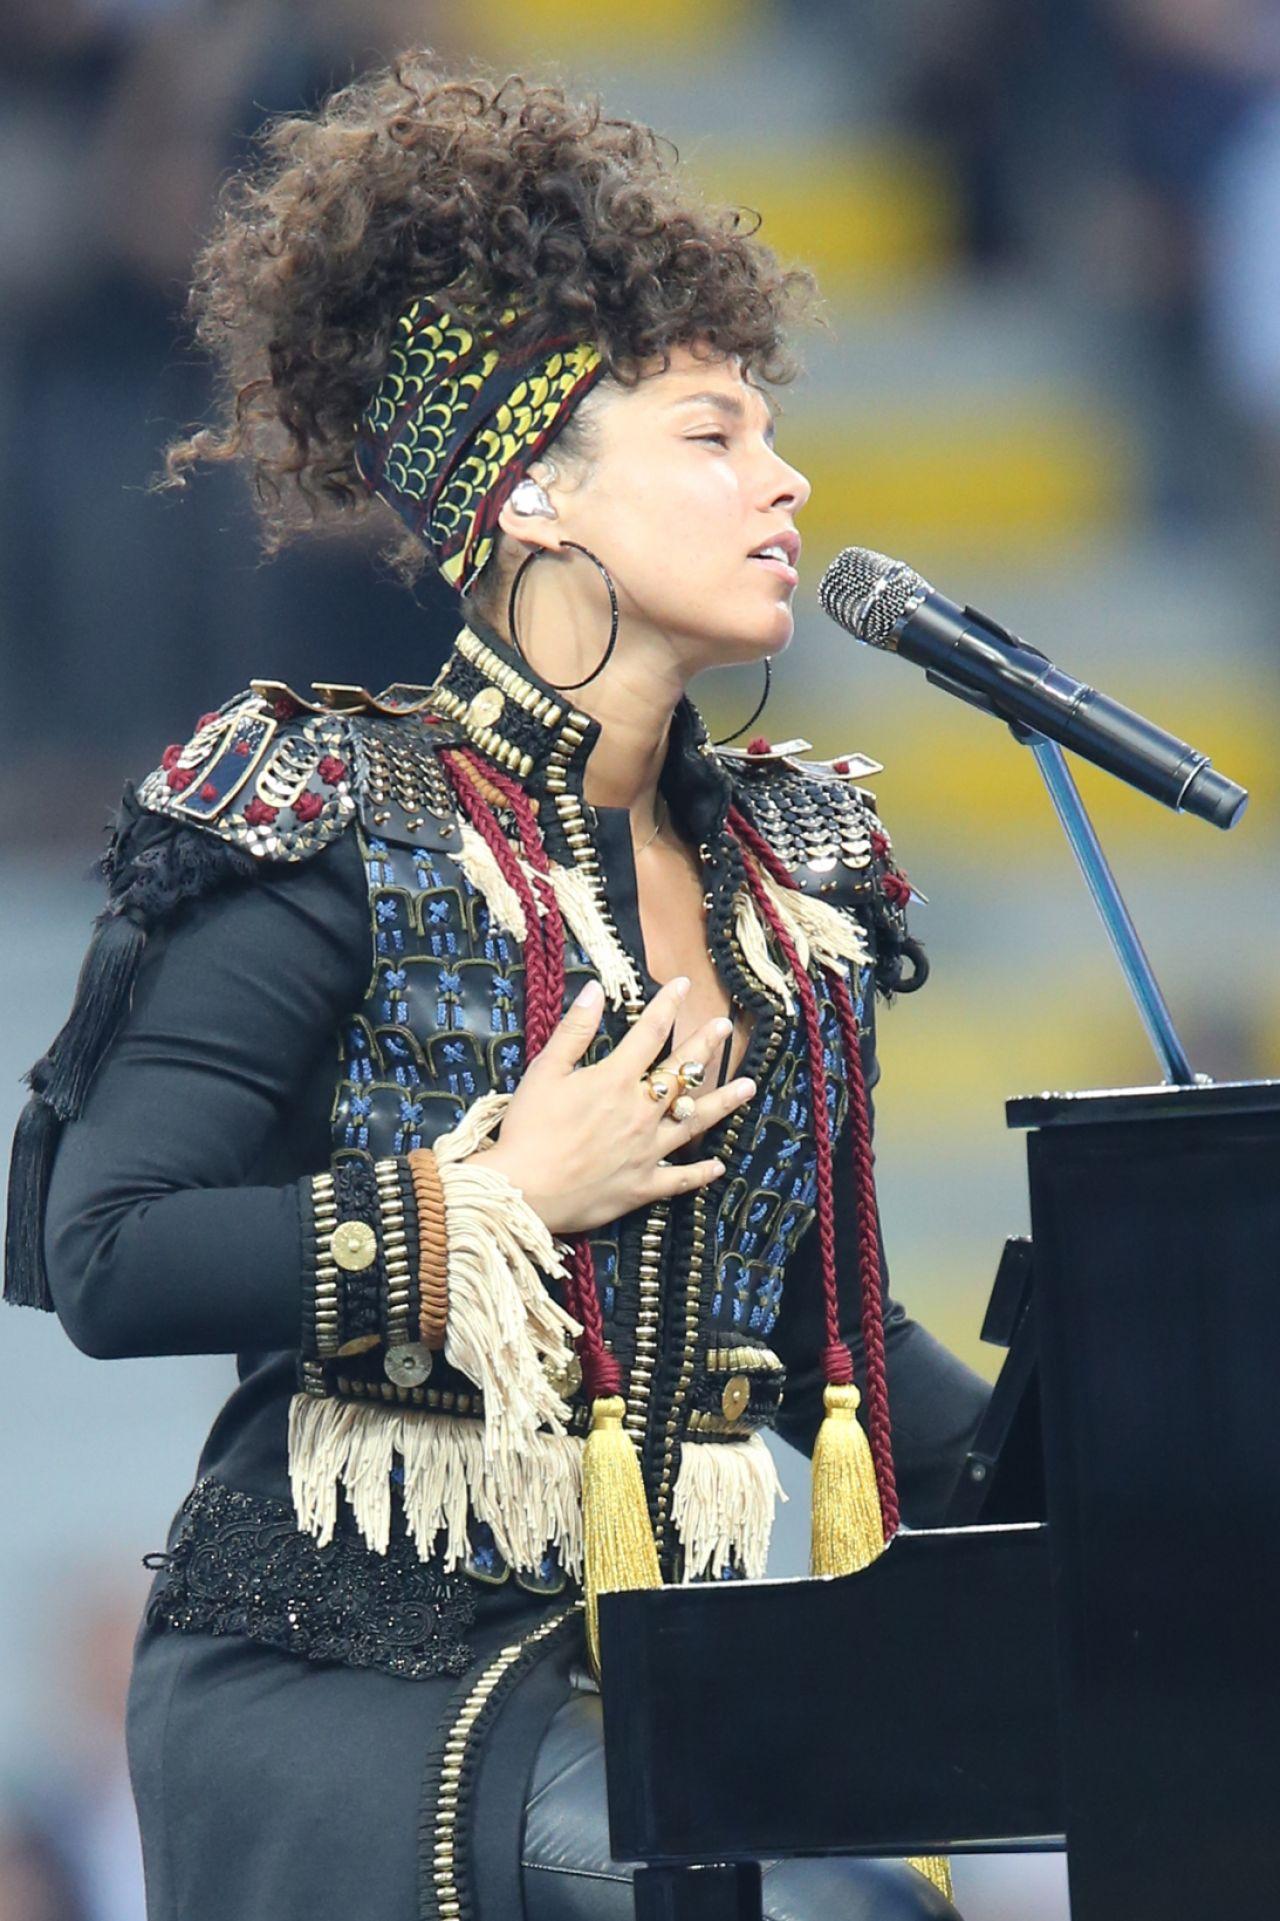 Alicia Keys Gives A Concert The UEFA Champions League